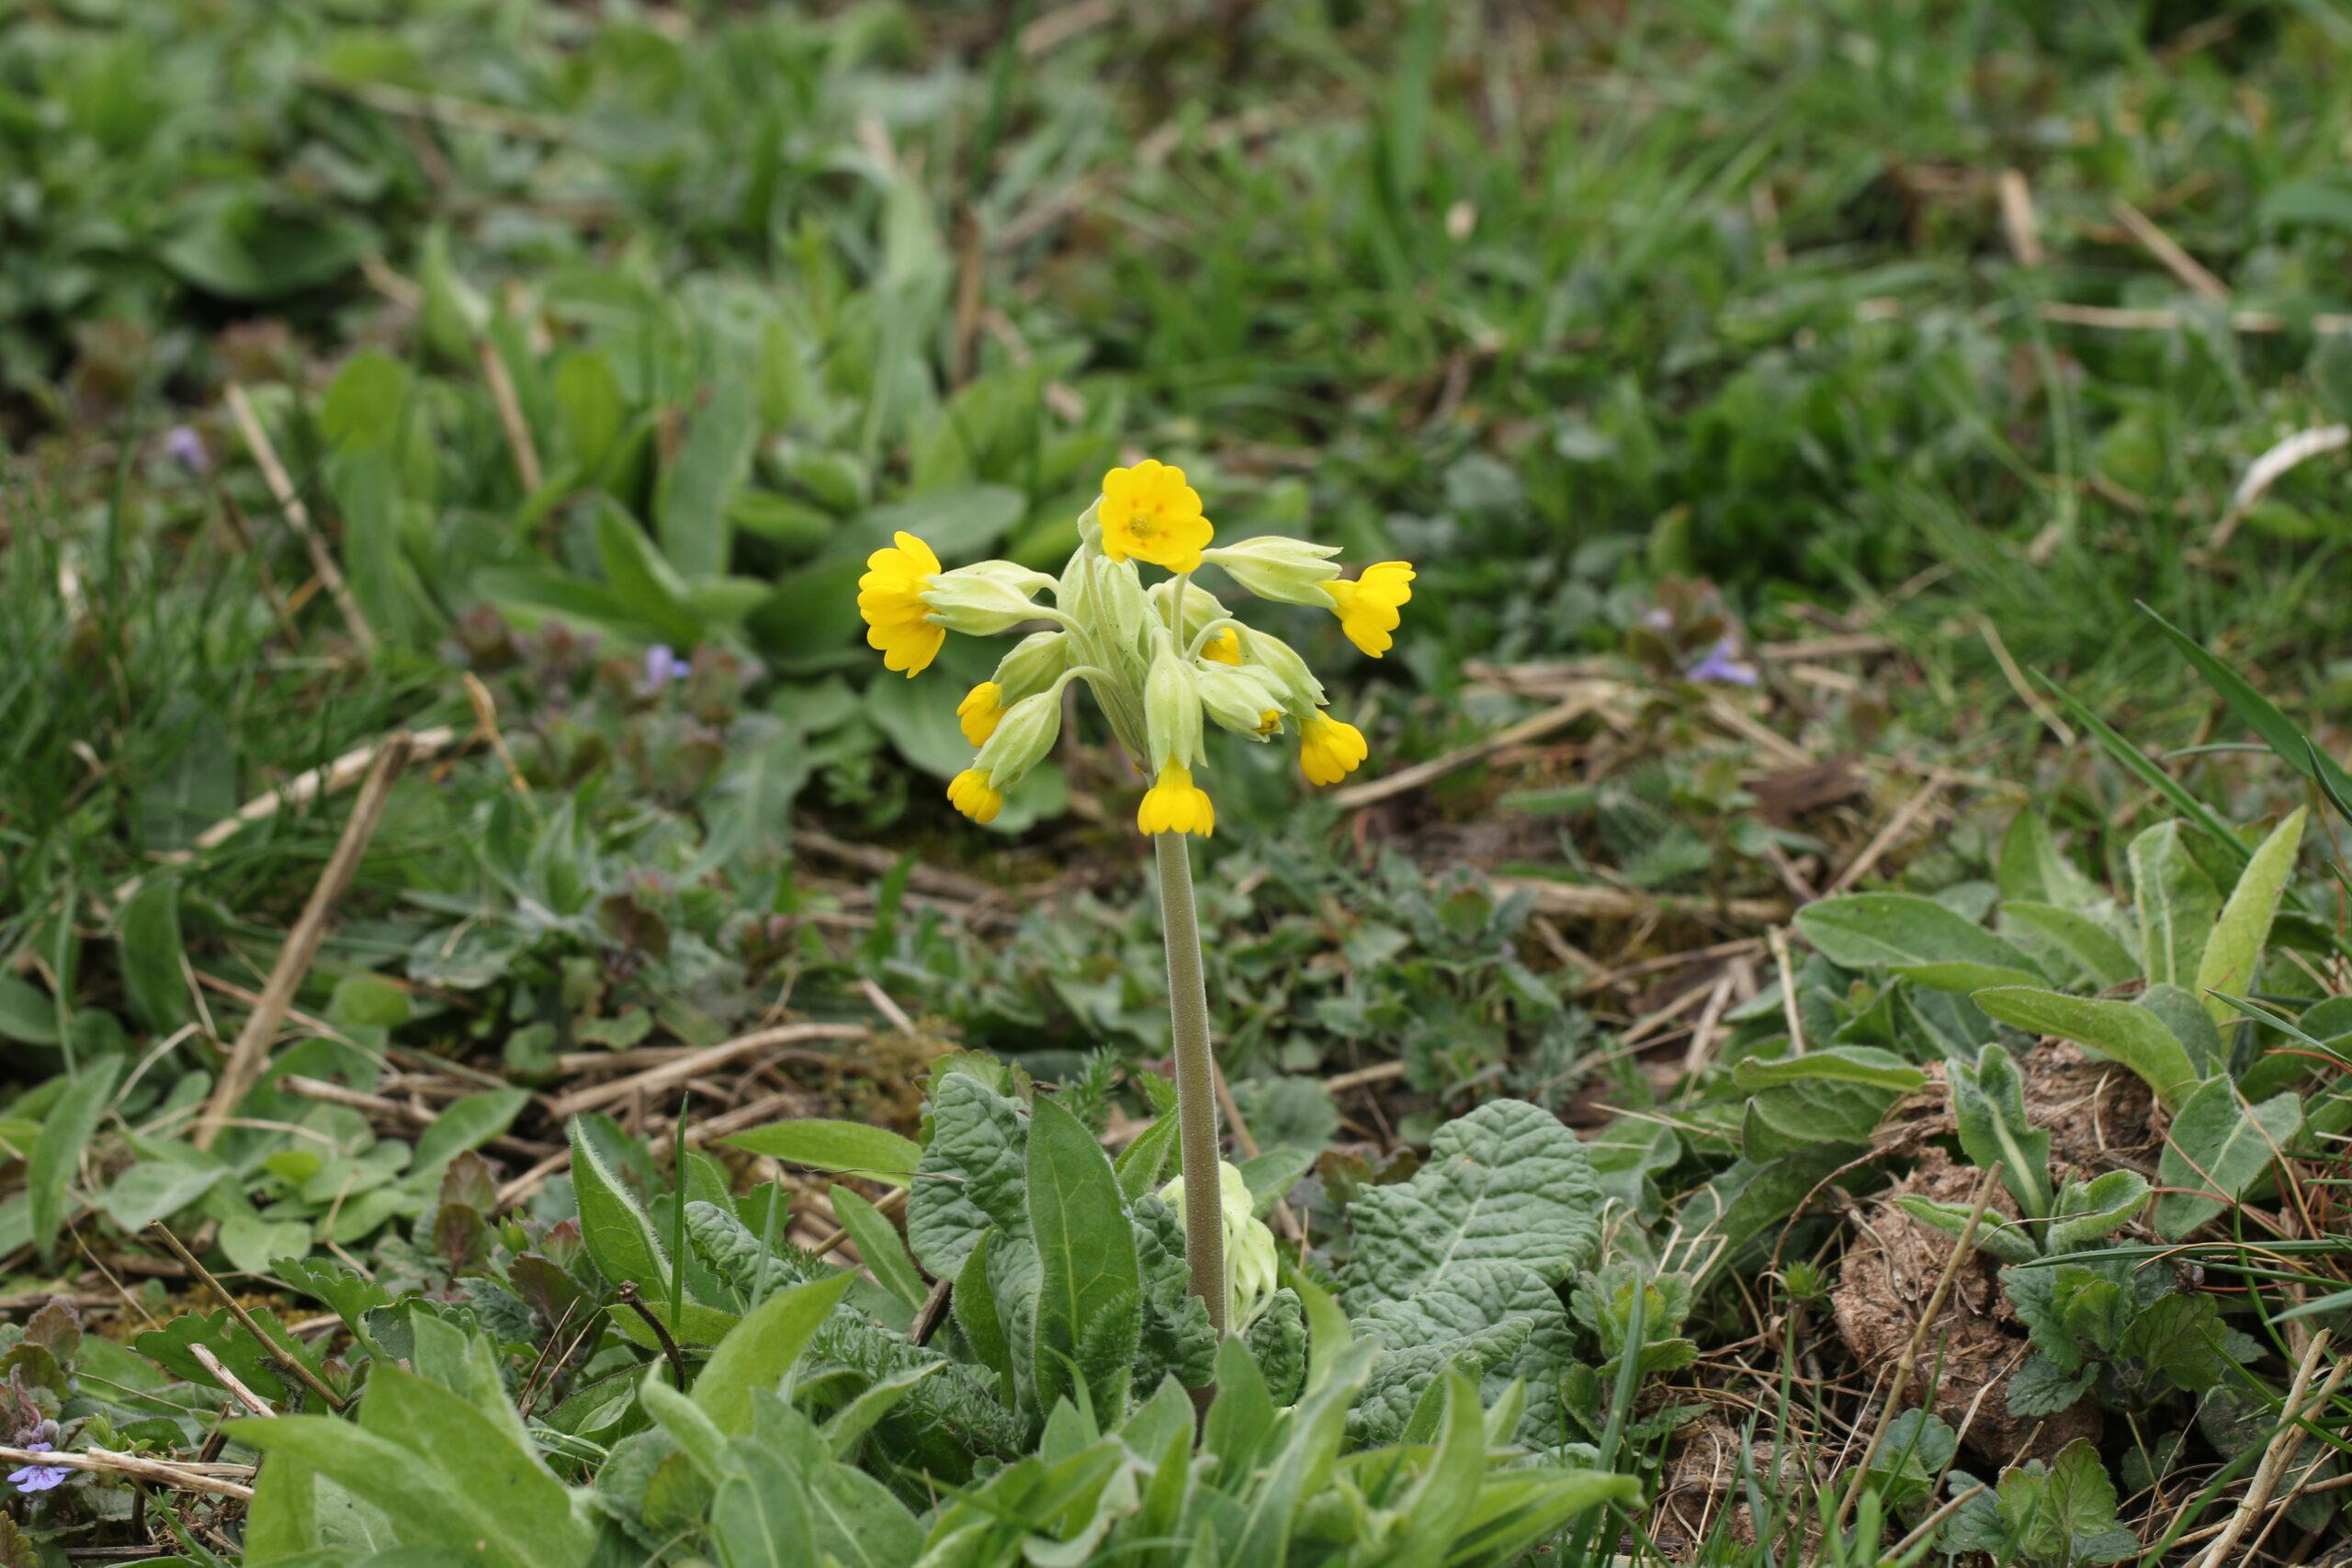 cowslips, water meadows, floral diversity, wildflowers, The Crankles, Bury Water Meadows Group, Bury St Edmunds,